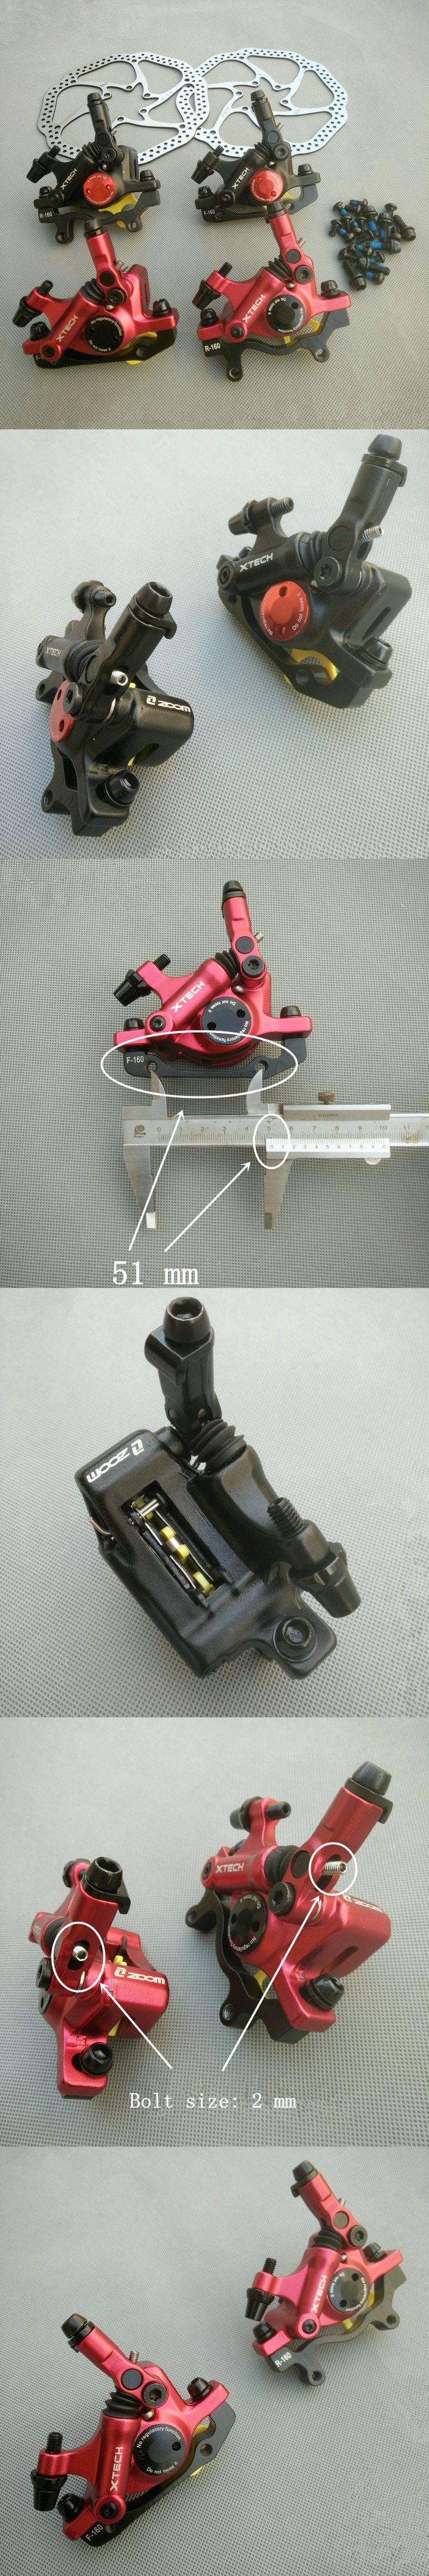 New line pulling hydraulic brake ZOOM HB-100 bicycle hydraulic disc brake caliper bicycle disc brake kit bike accessories